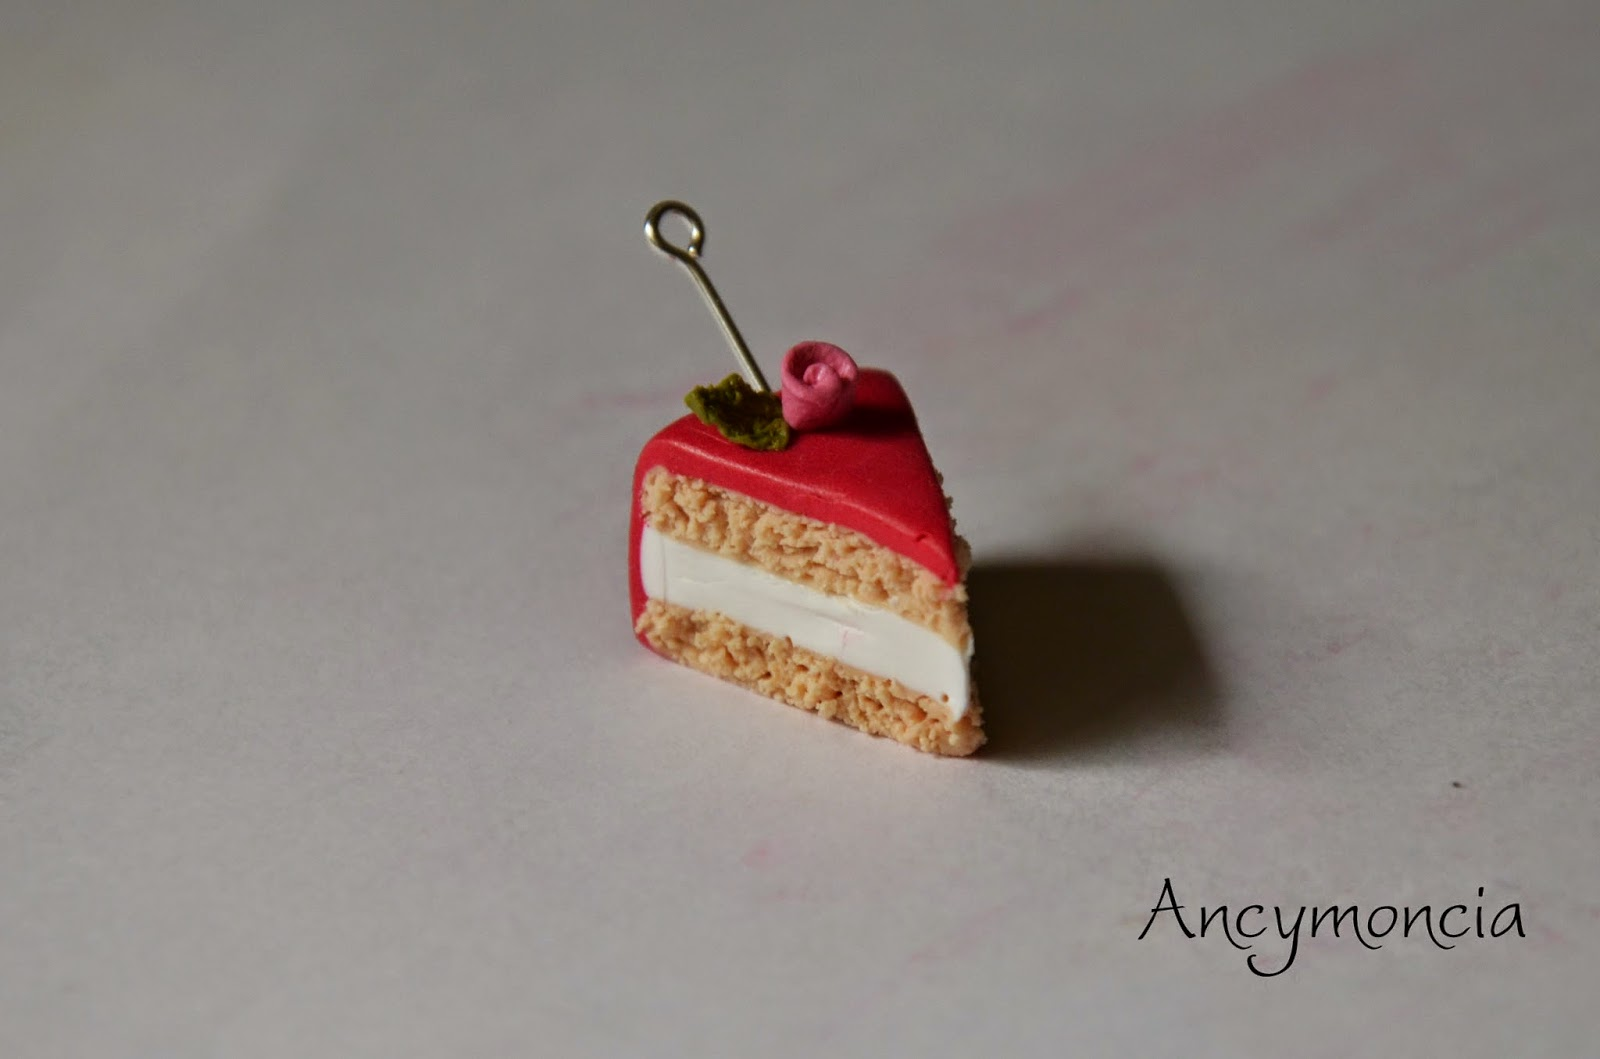 http://ancymoncia.blogspot.com/2014/04/tutorial-kawaek-ciasta.html